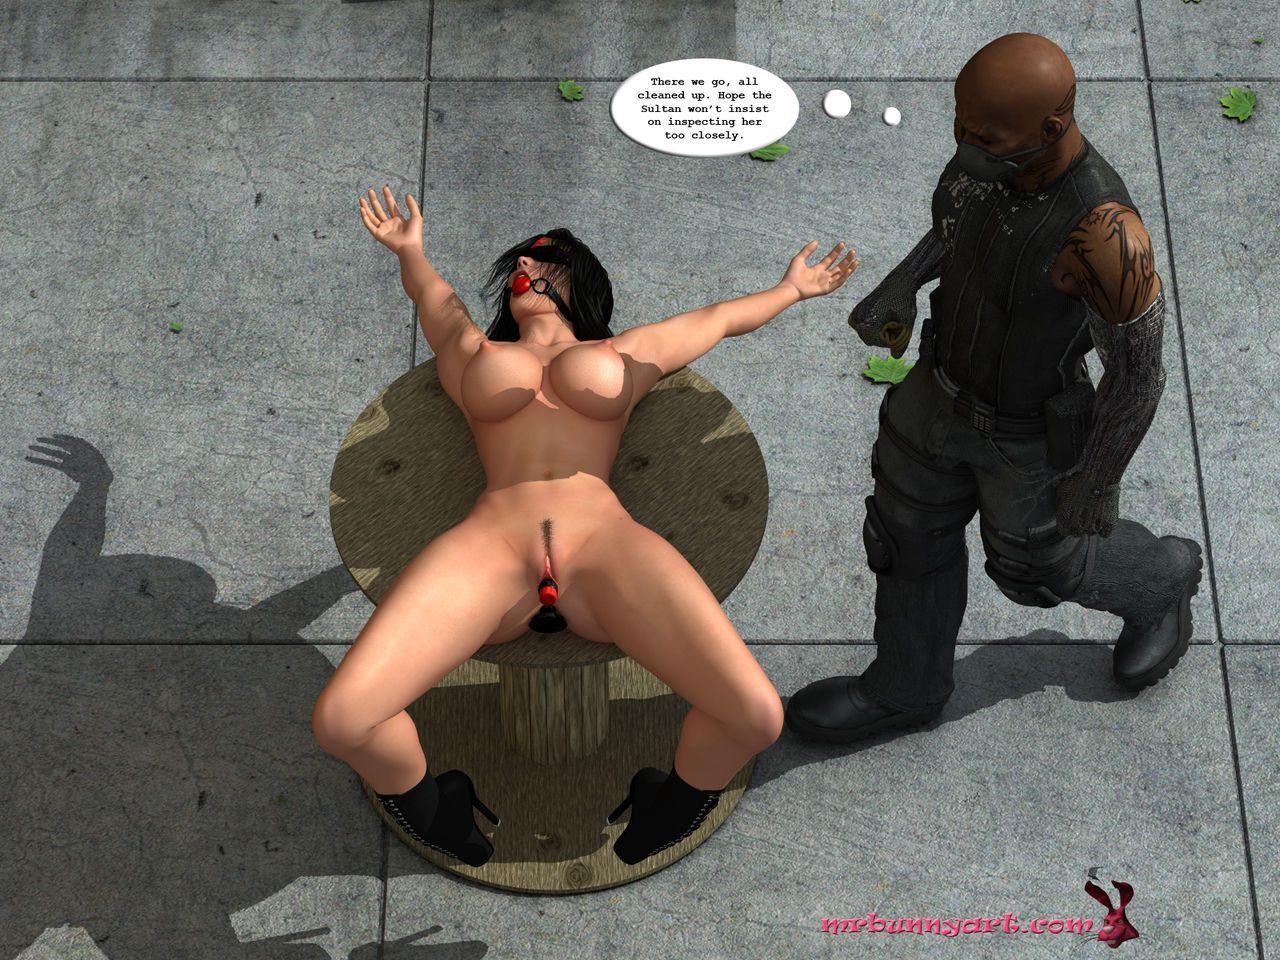 [MrBunnyArt] wonder woman vs cain (wonder woman) [English] - part 2